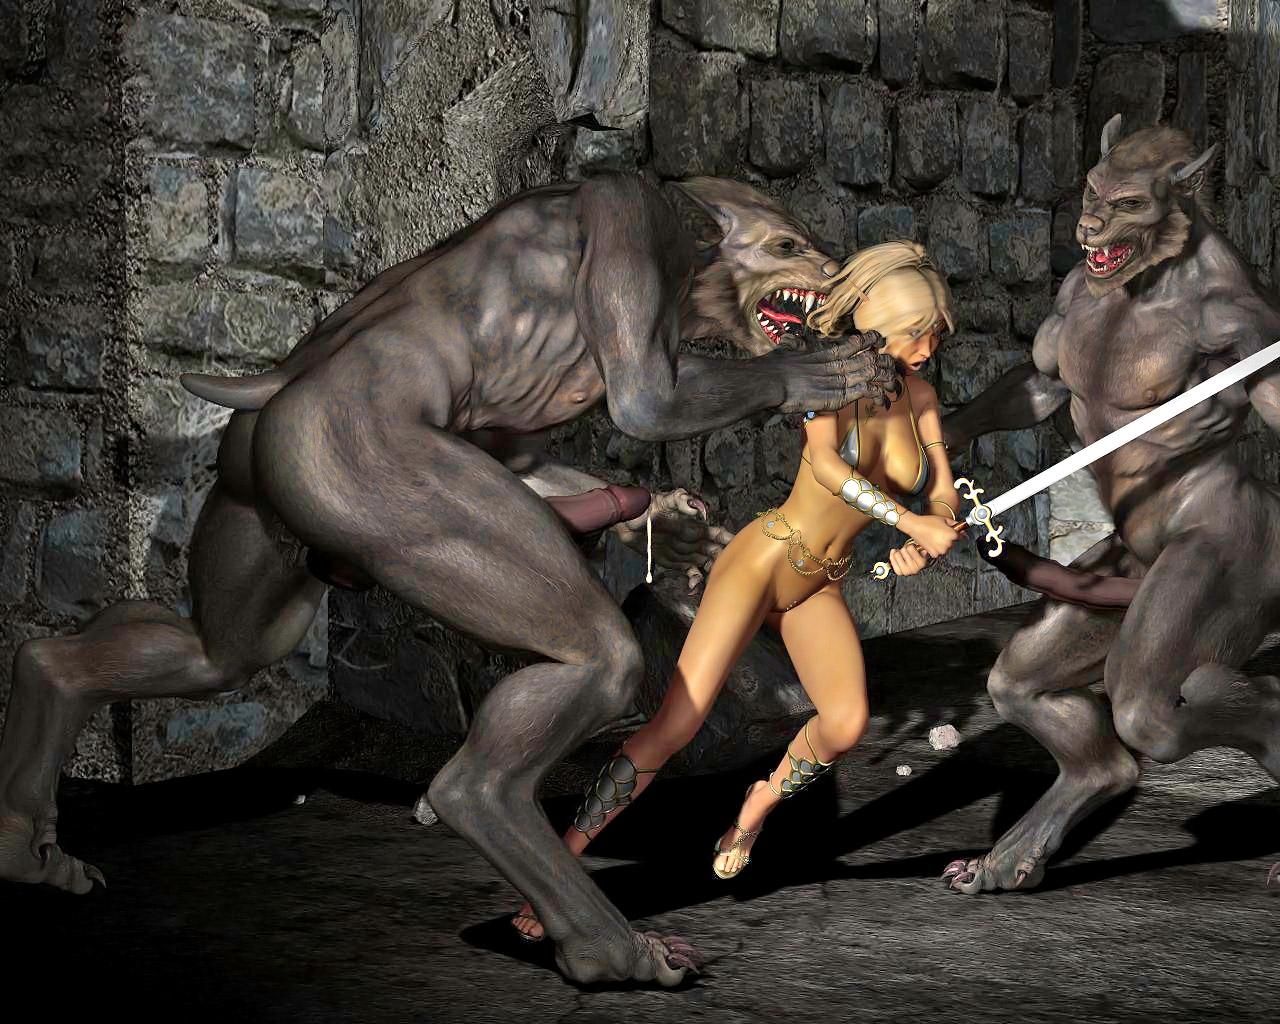 Trolls monsters demons sex pron photos